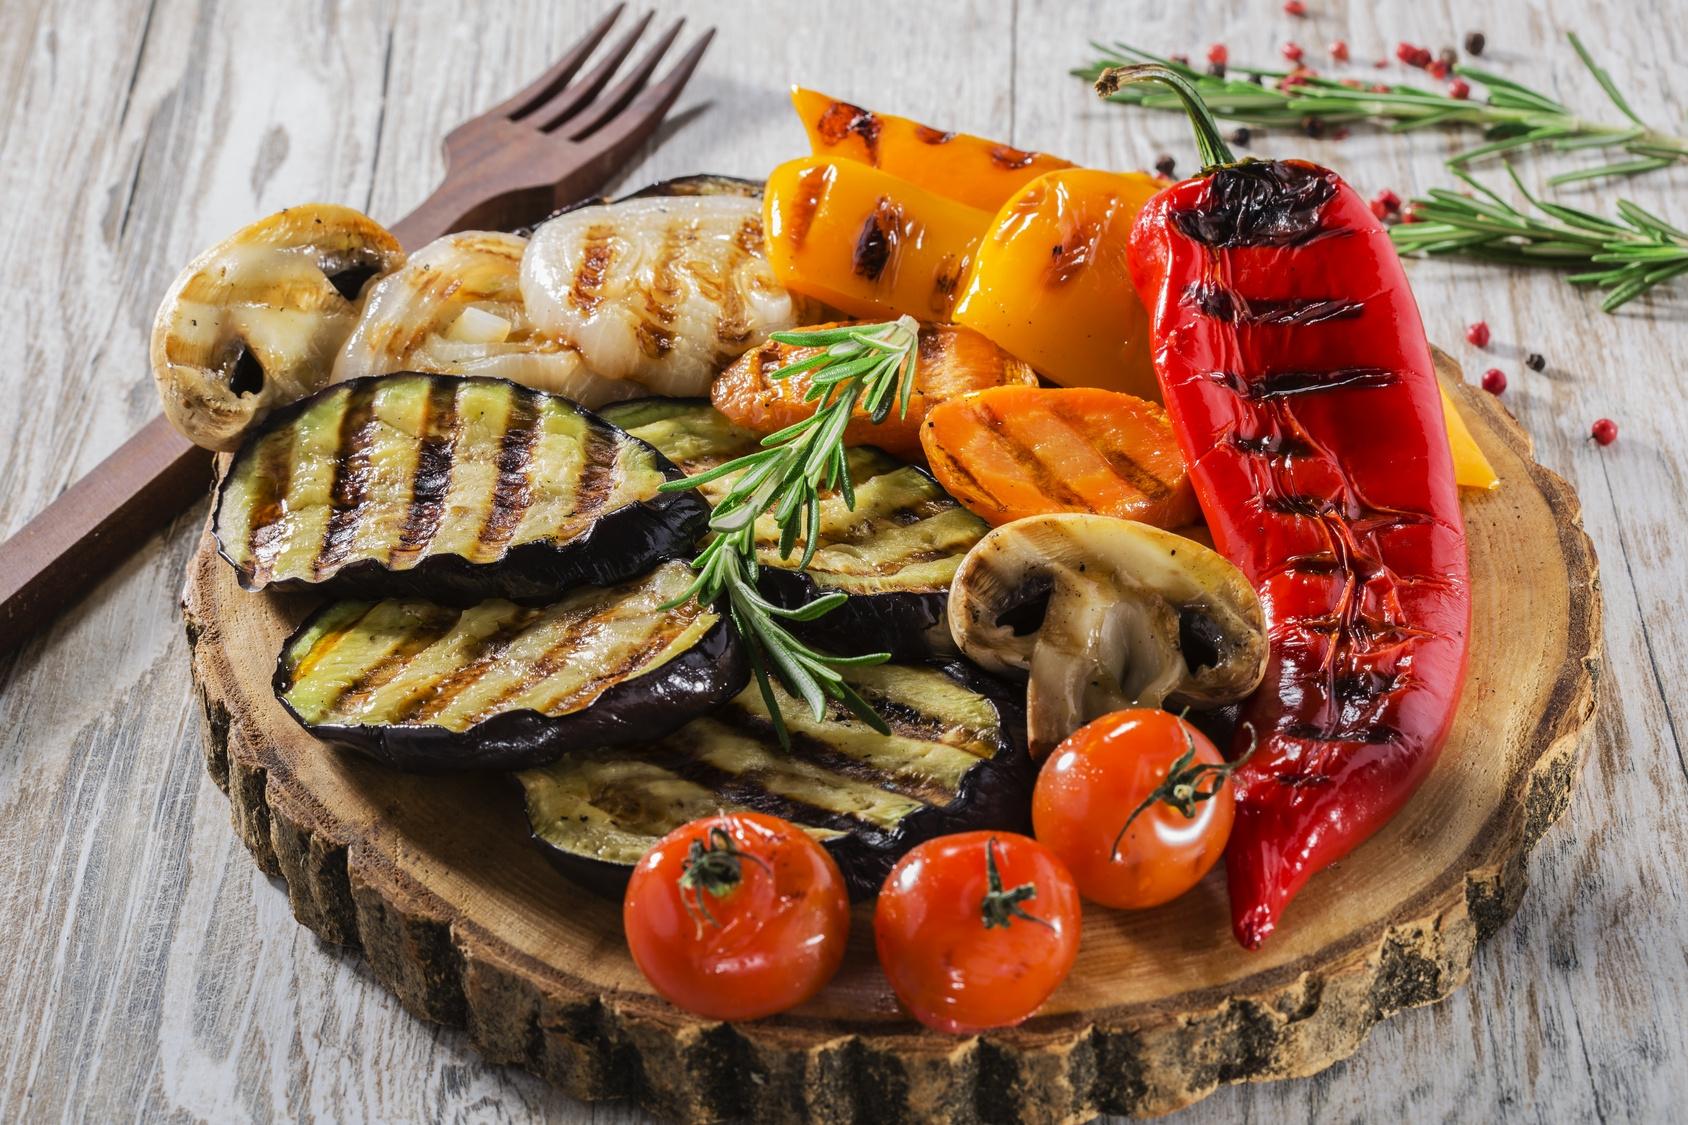 verdure alla griglia